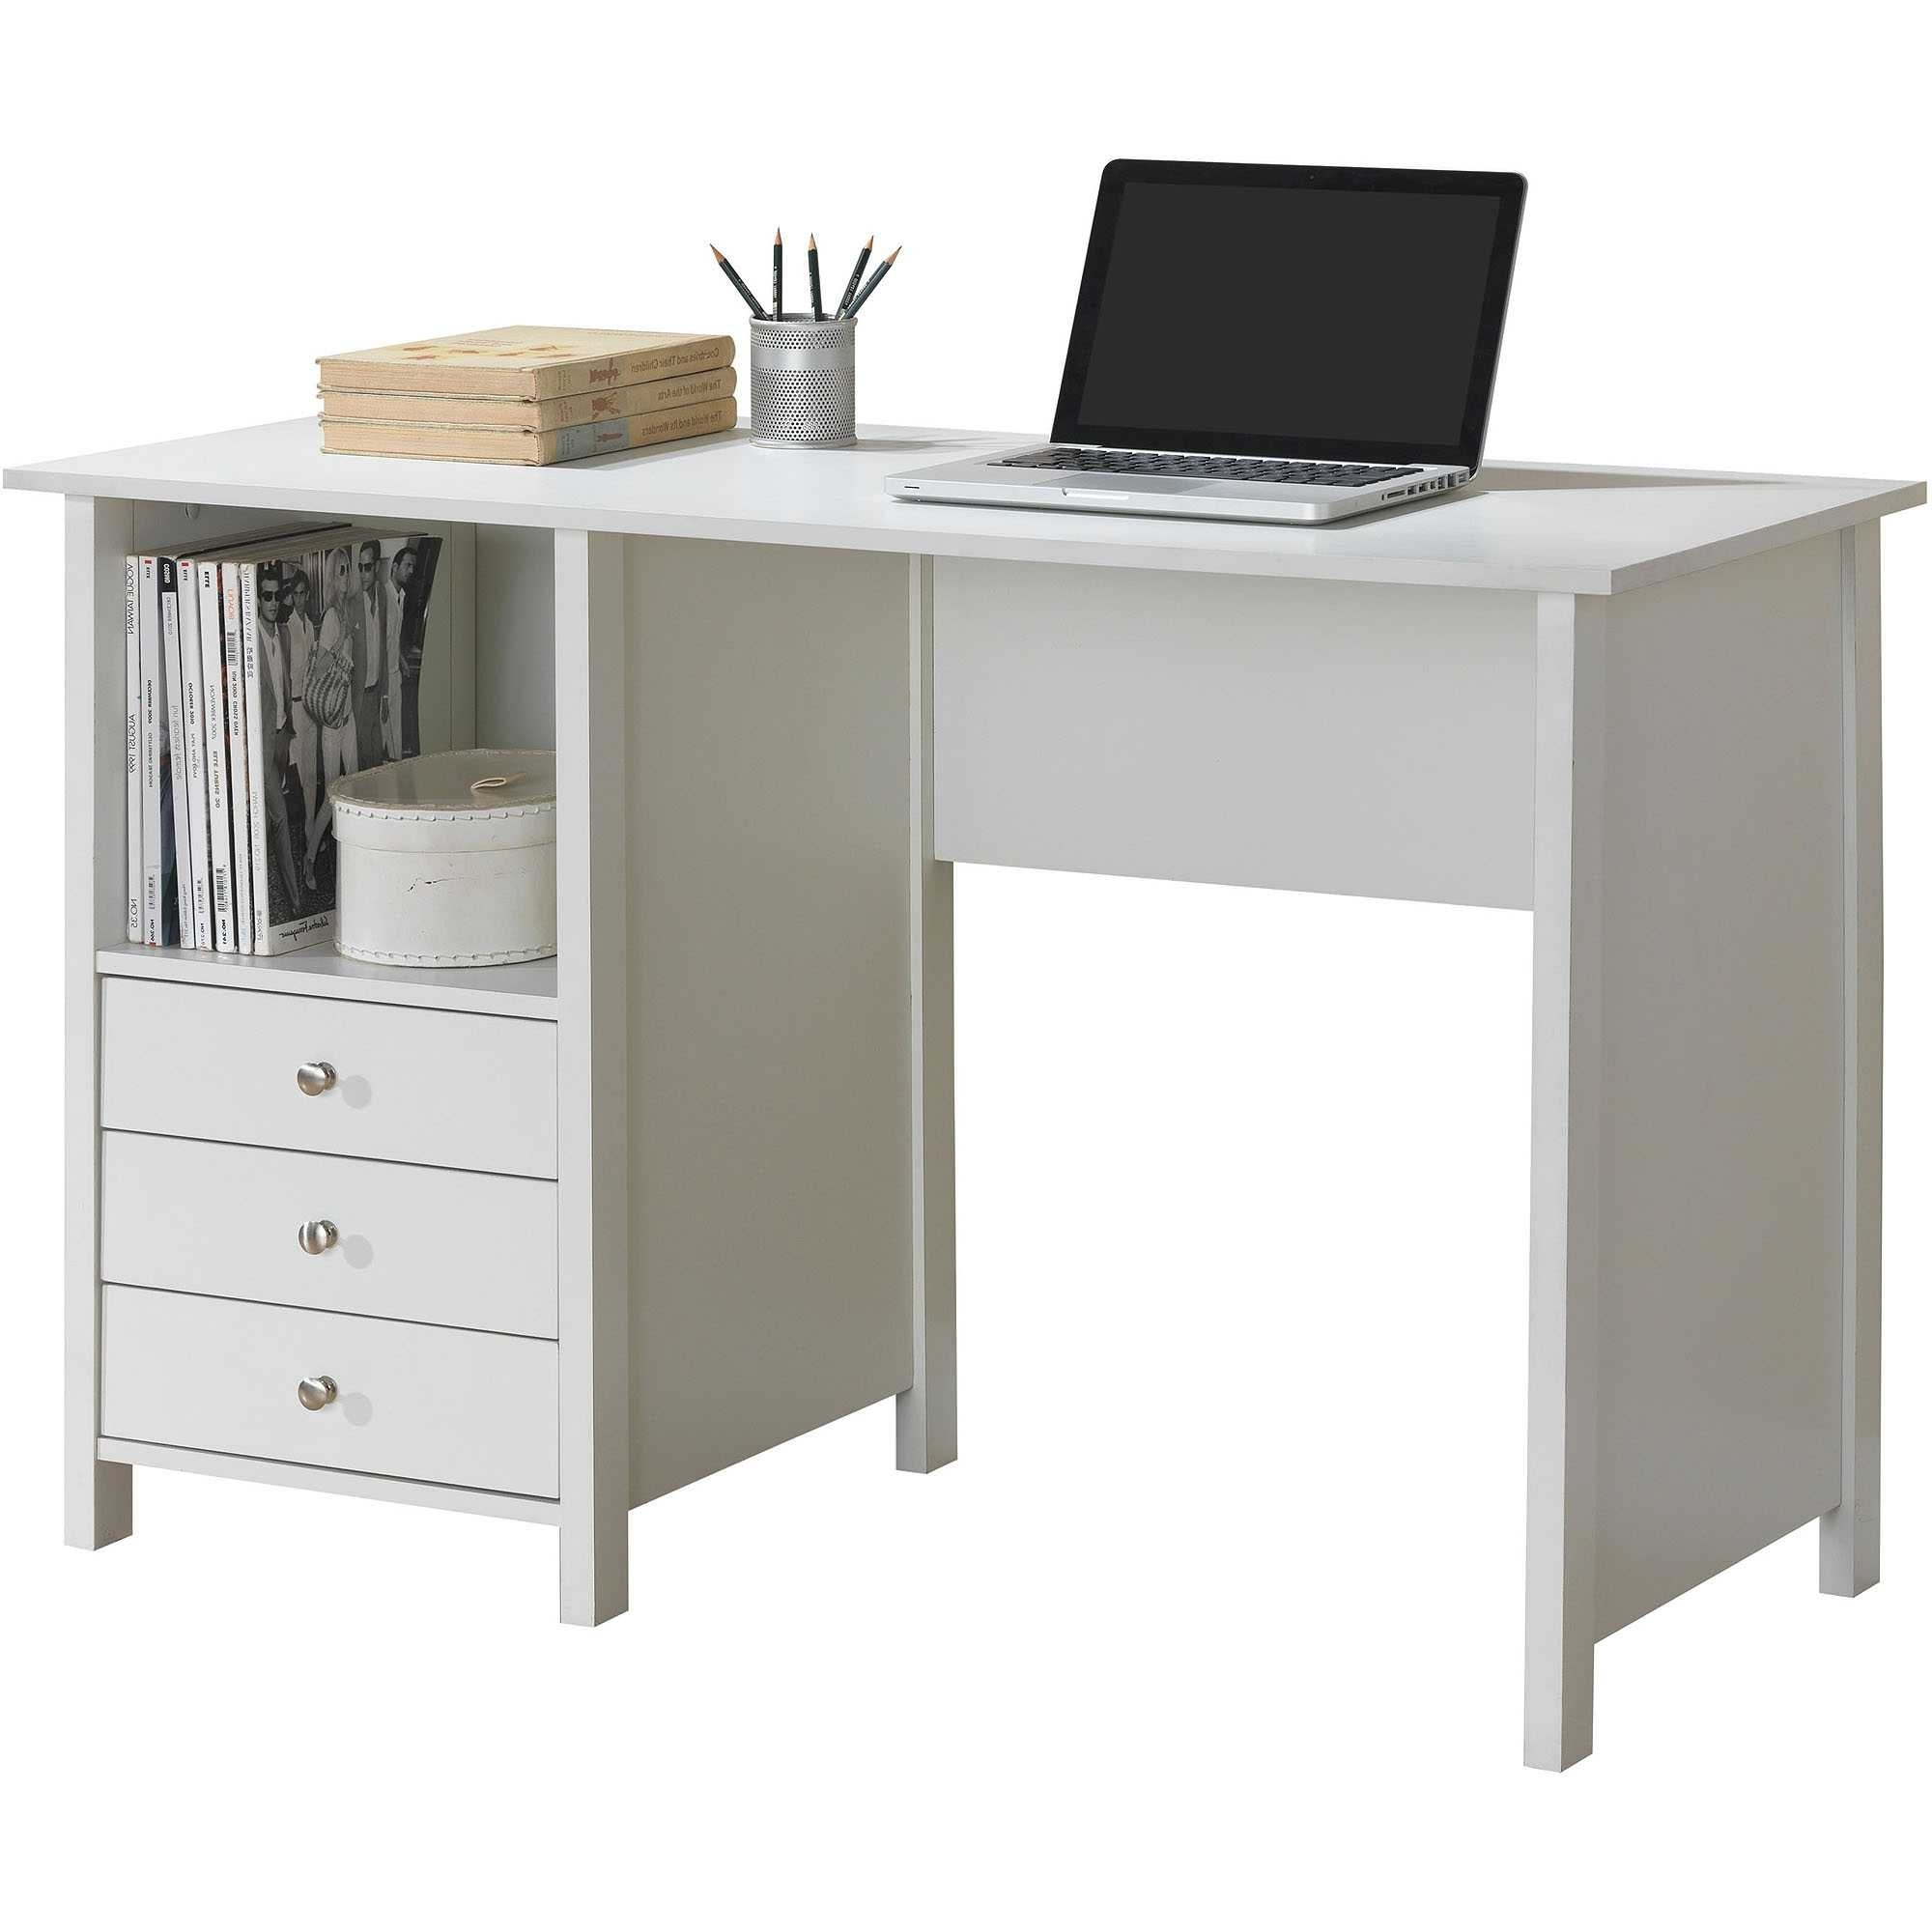 Computer Desks At Walmart Intended For Most Recent New Walmart Computer Desk Stumbleupon Image Ypq – Home Design Ideas (View 14 of 20)